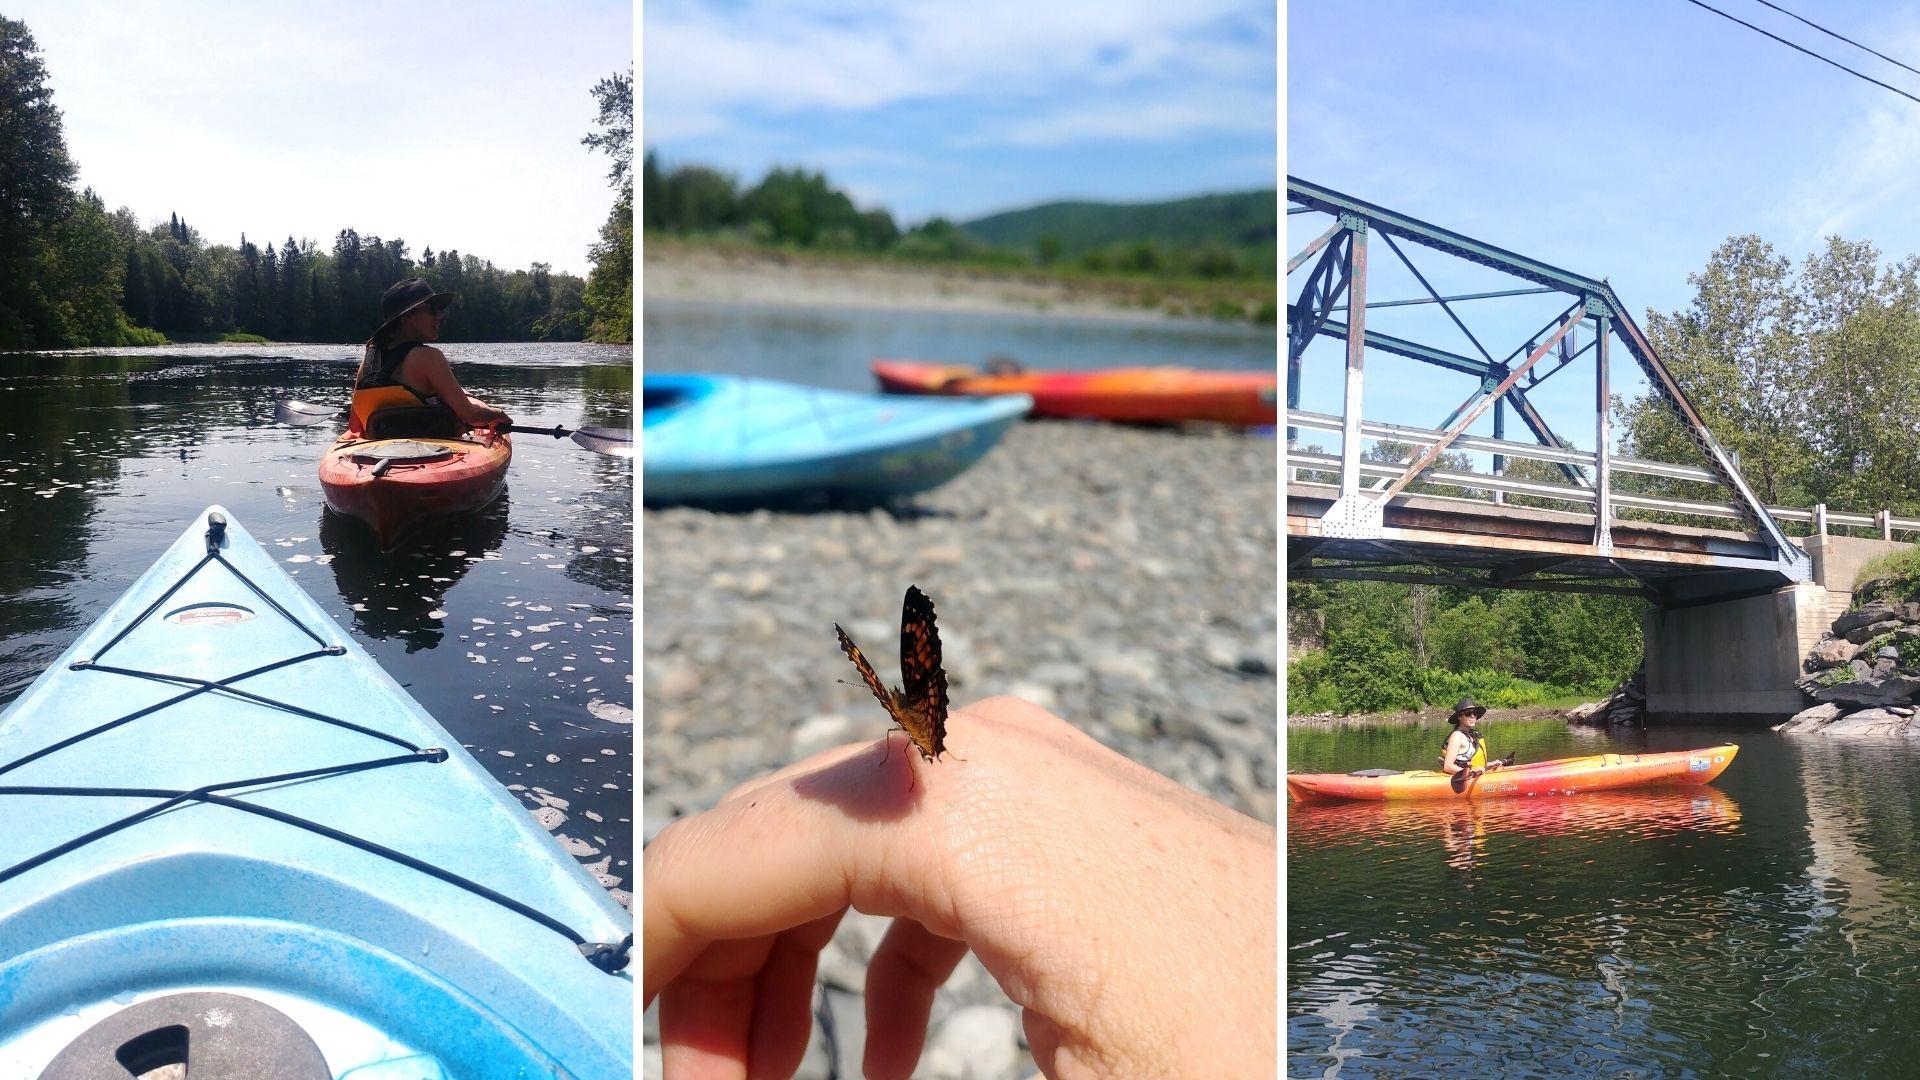 Visiter Edmundston kayak Rivière Verte Kasakayak Nouveau-Brunswick